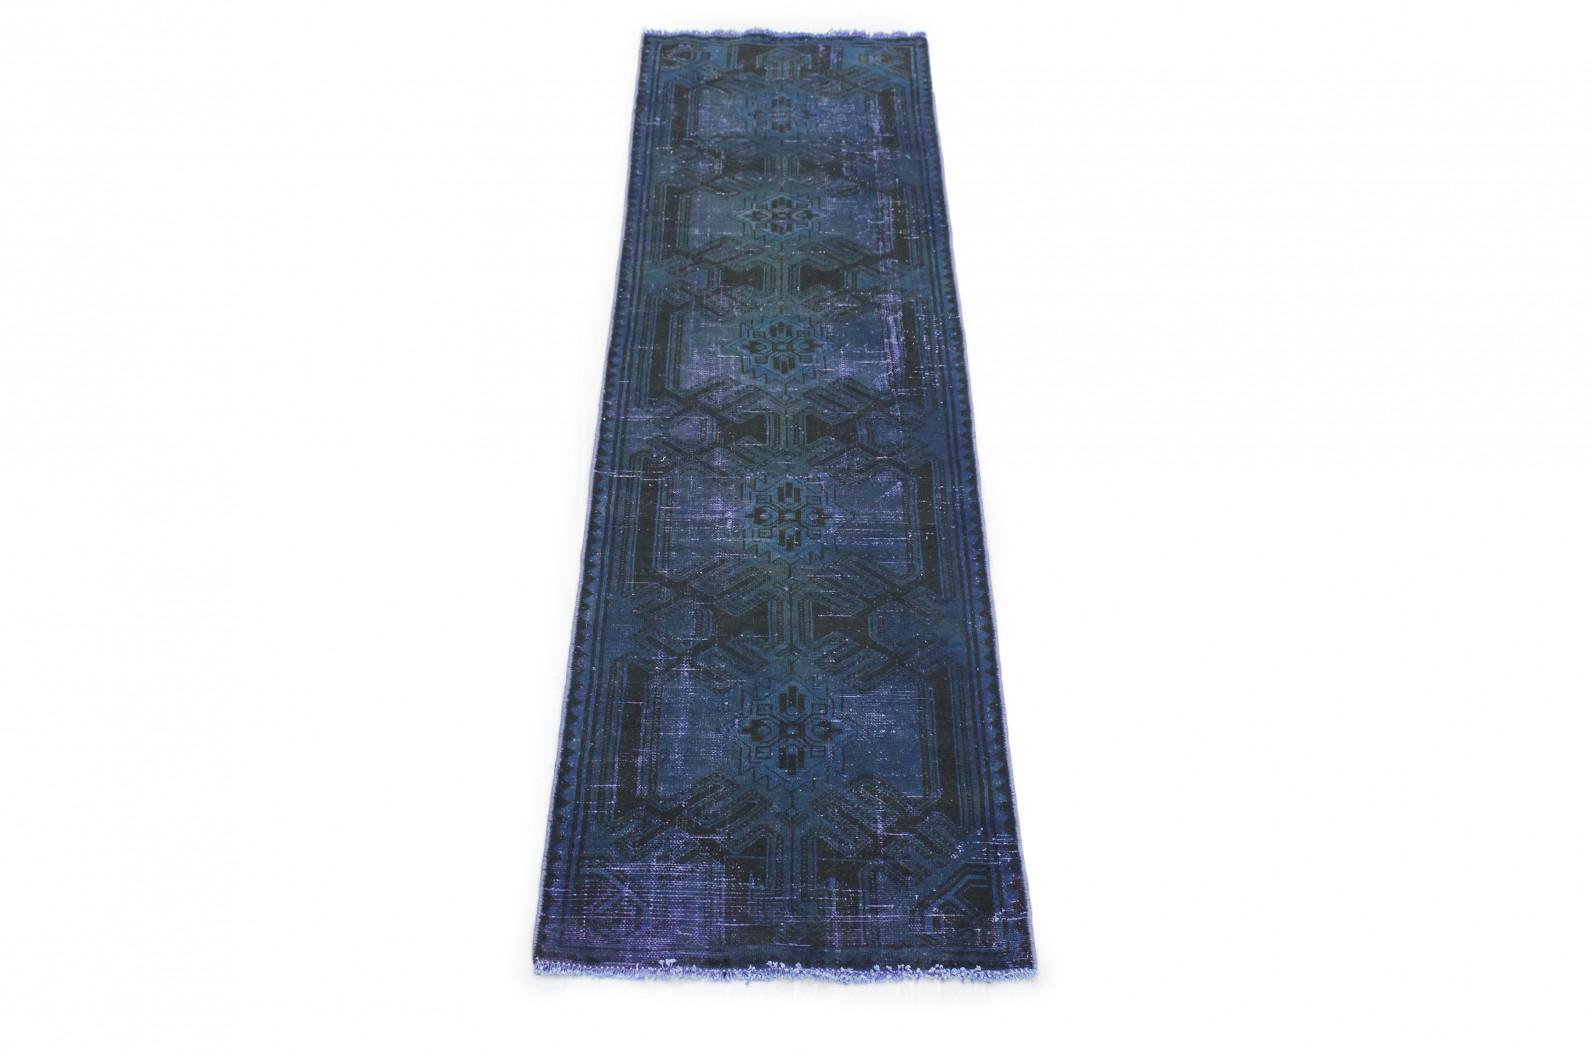 Vintage Teppich Laufer Blau In 300x80 1001 177257 Bei Carpetido De